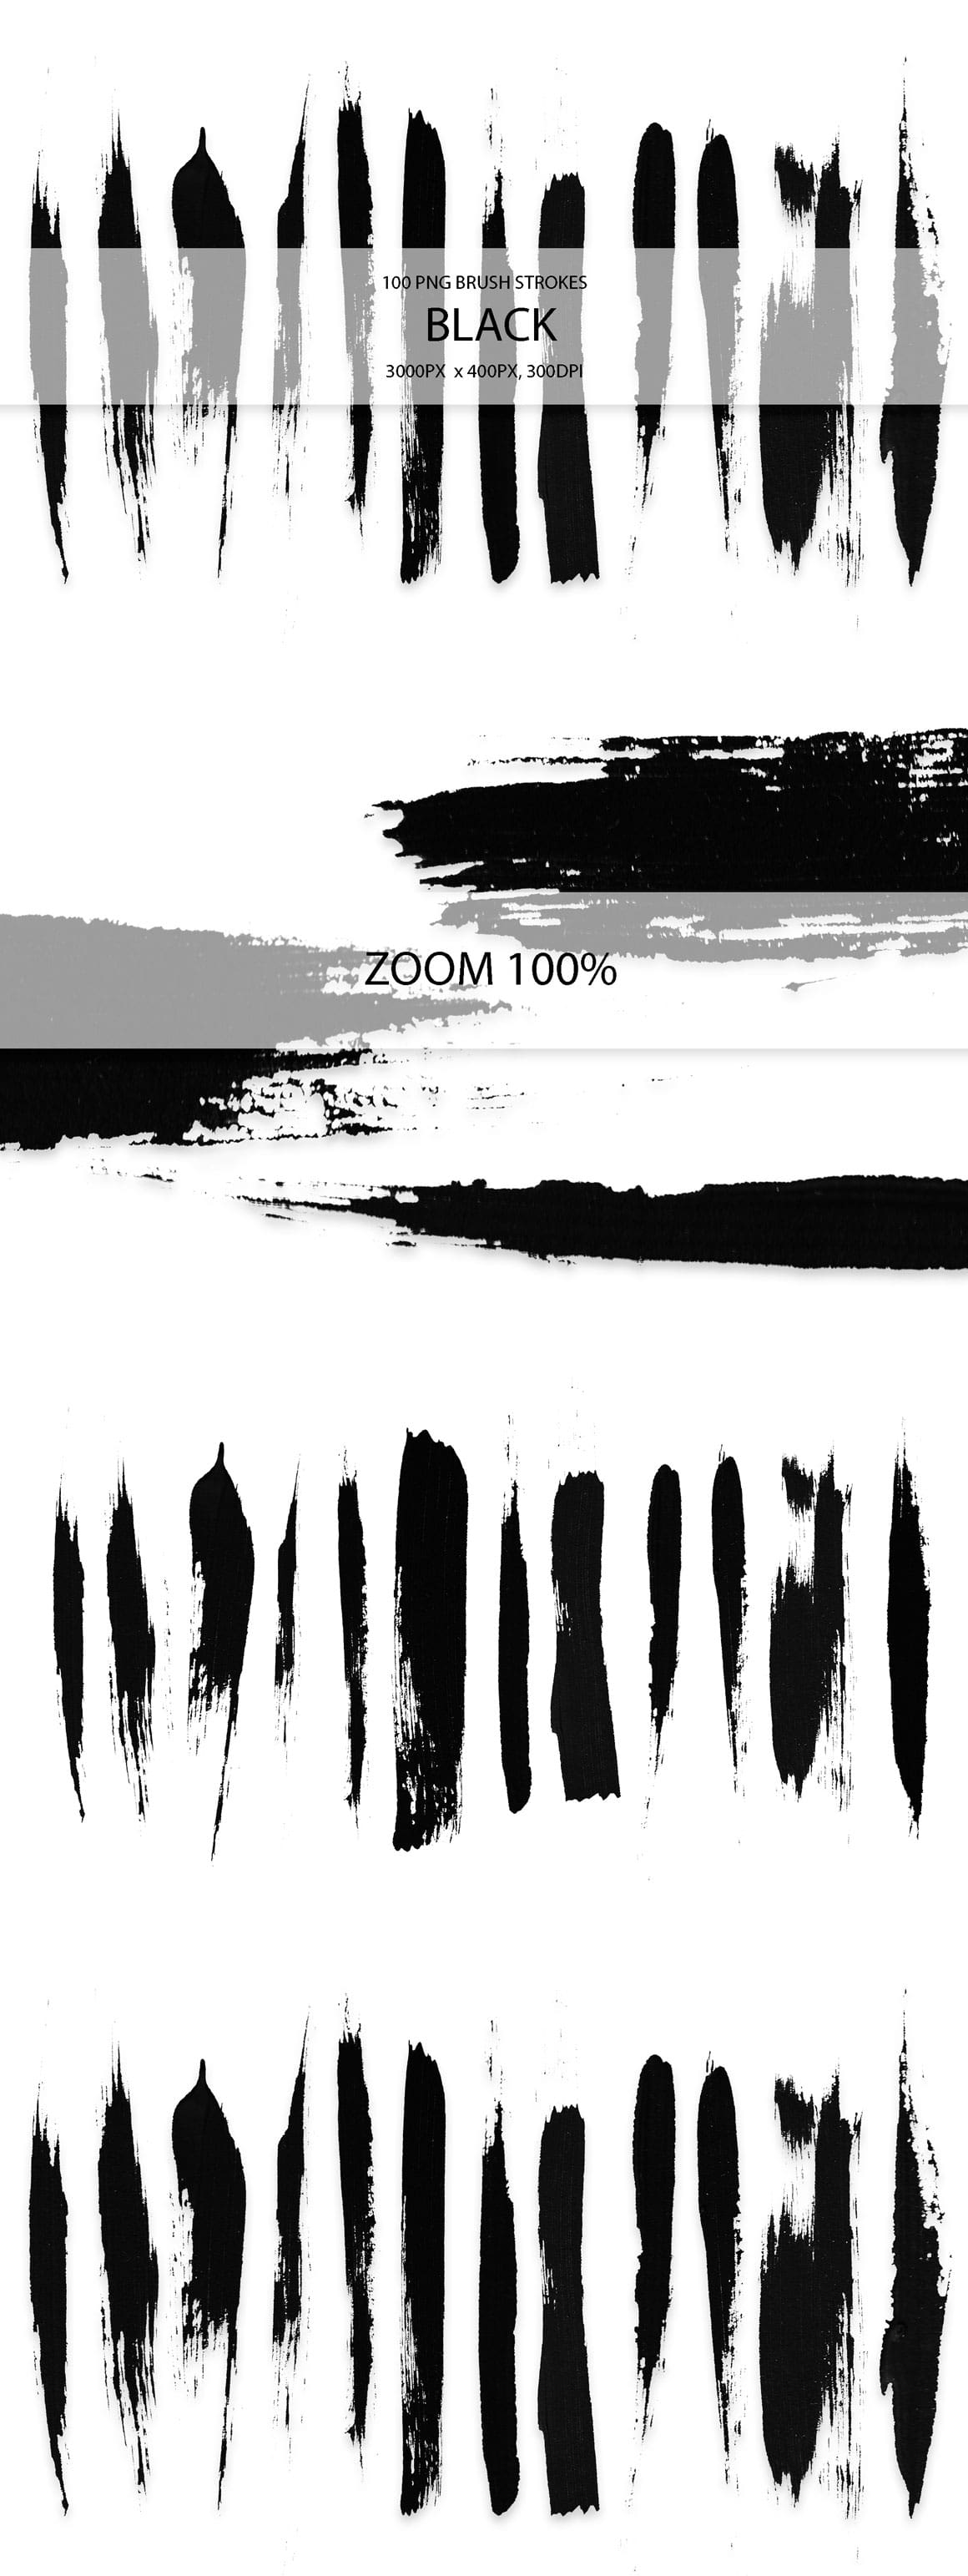 829 Acrylic Brush Strokes and Digital Brush Strokes - $9 - BlackBrushStrokes 01 min